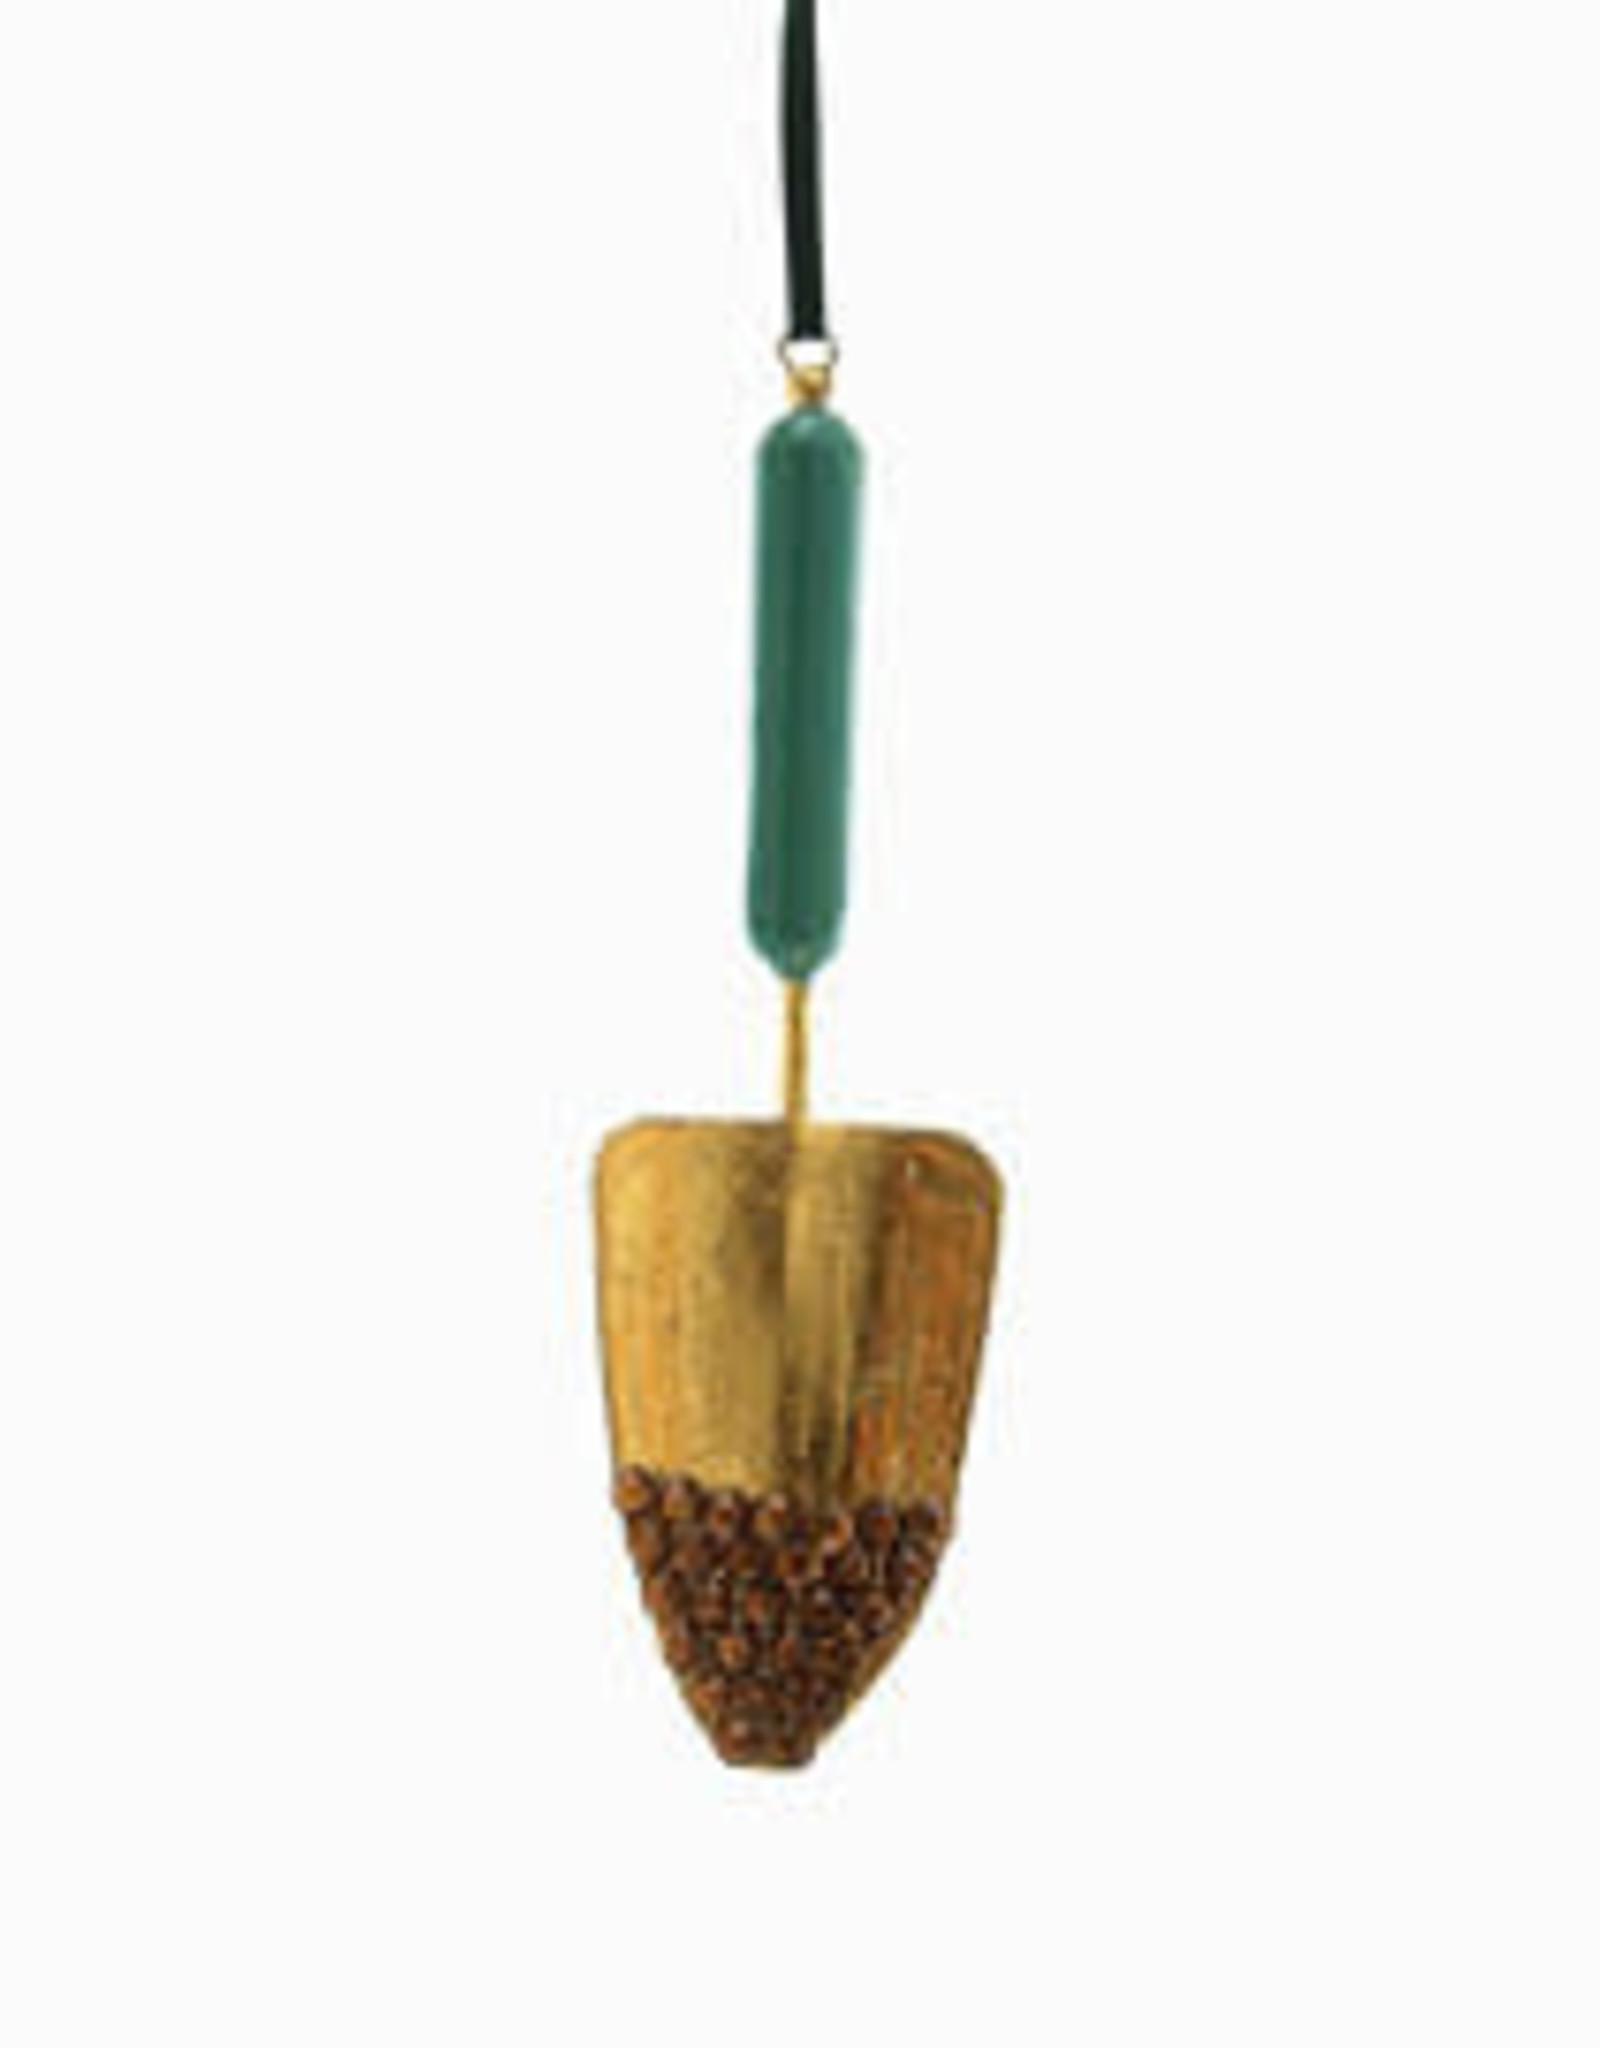 Cody Foster Jeweled Trowel Ornament